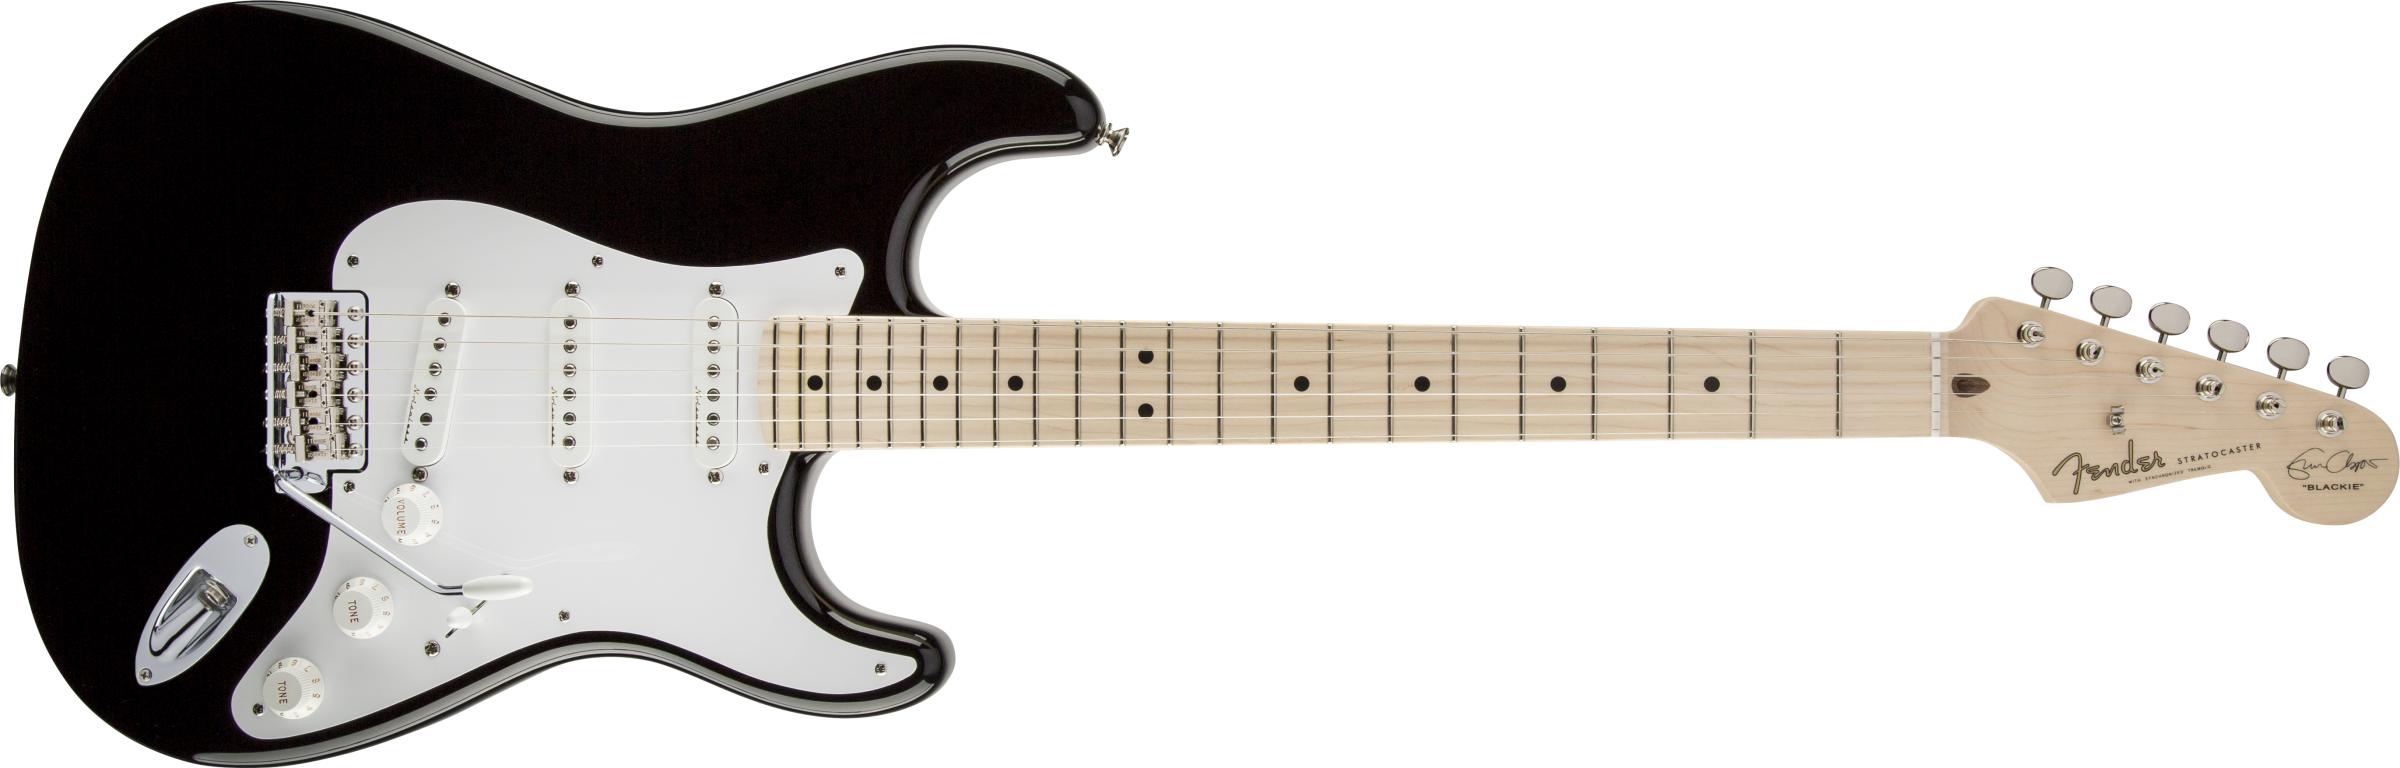 FENDER-Eric-Clapton-Stratocaster-Maple-Fingerboard-Black-sku-571000268